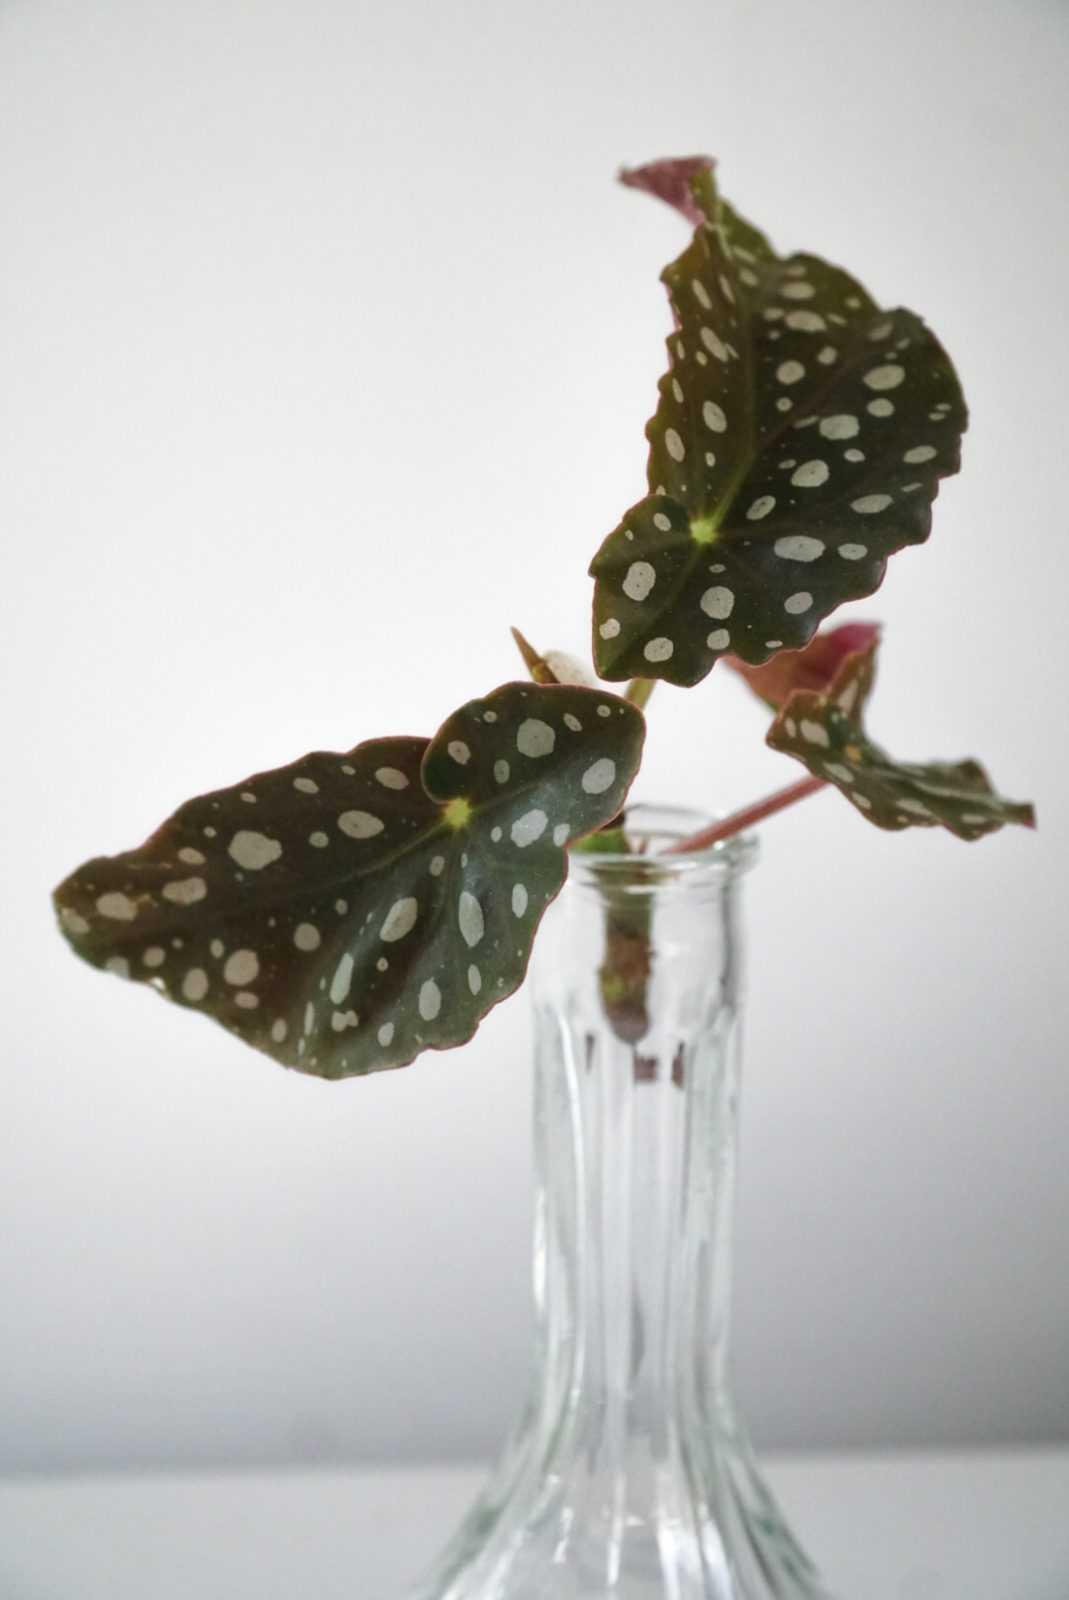 begonia maculta stippenbegonia polkadotplant polka dot polkadot kopstek plant plantje stek stekje terracotta pot potje glas glaasje rood